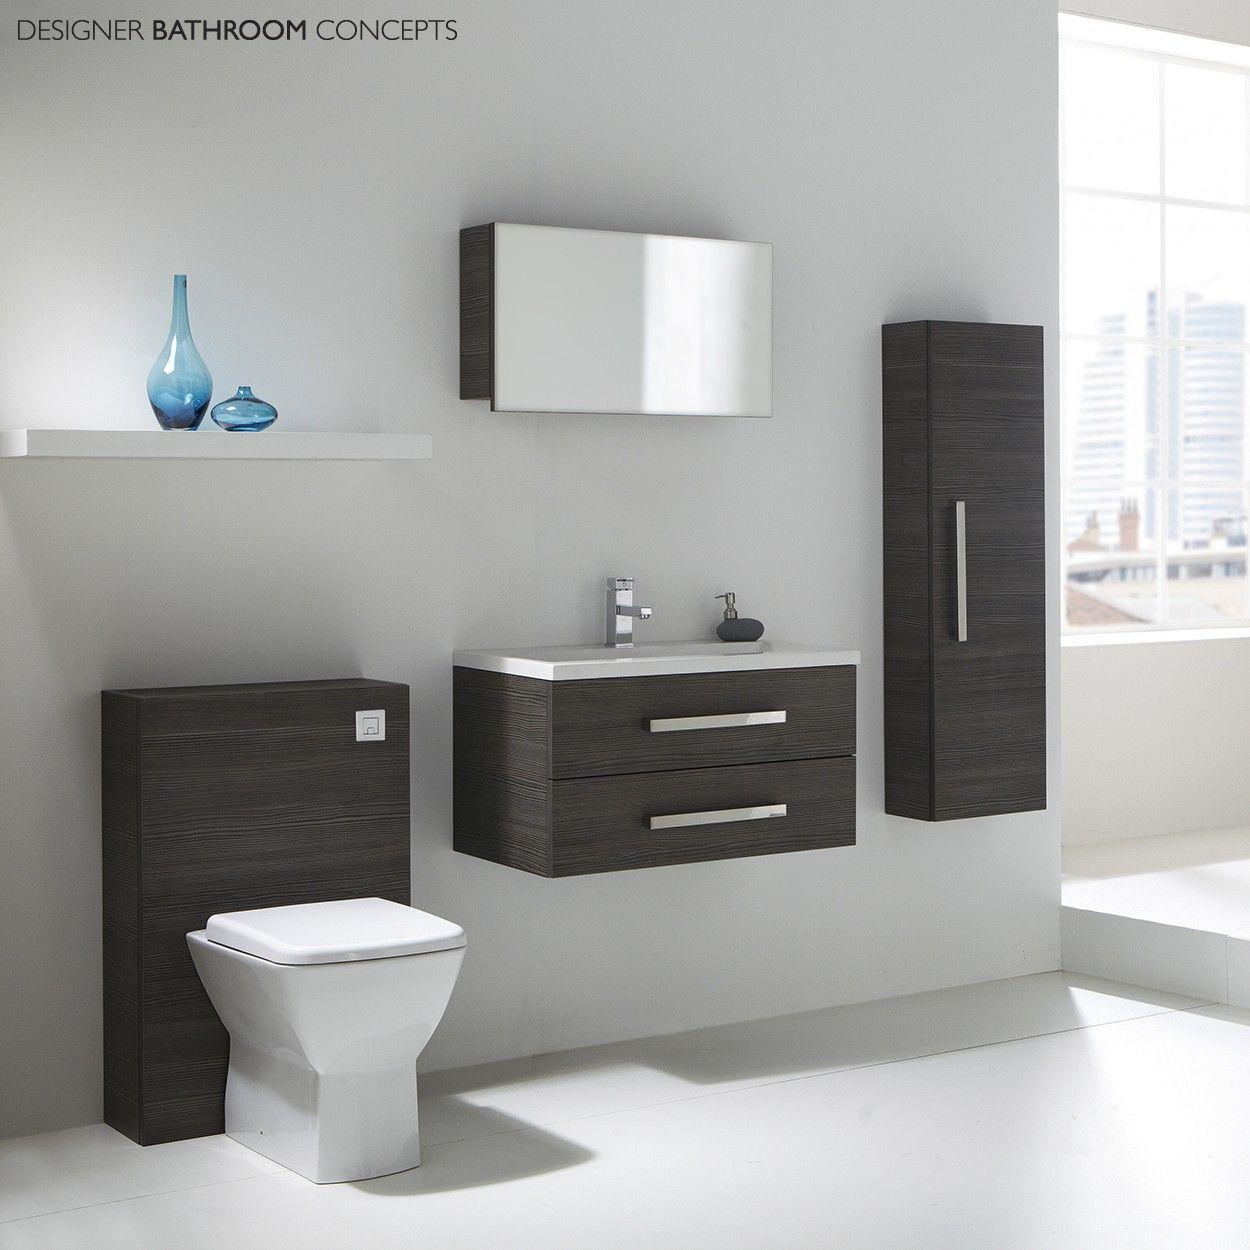 best sneakers e13a0 d07c1 aquatrend designer modular bathroom furniture collection ...